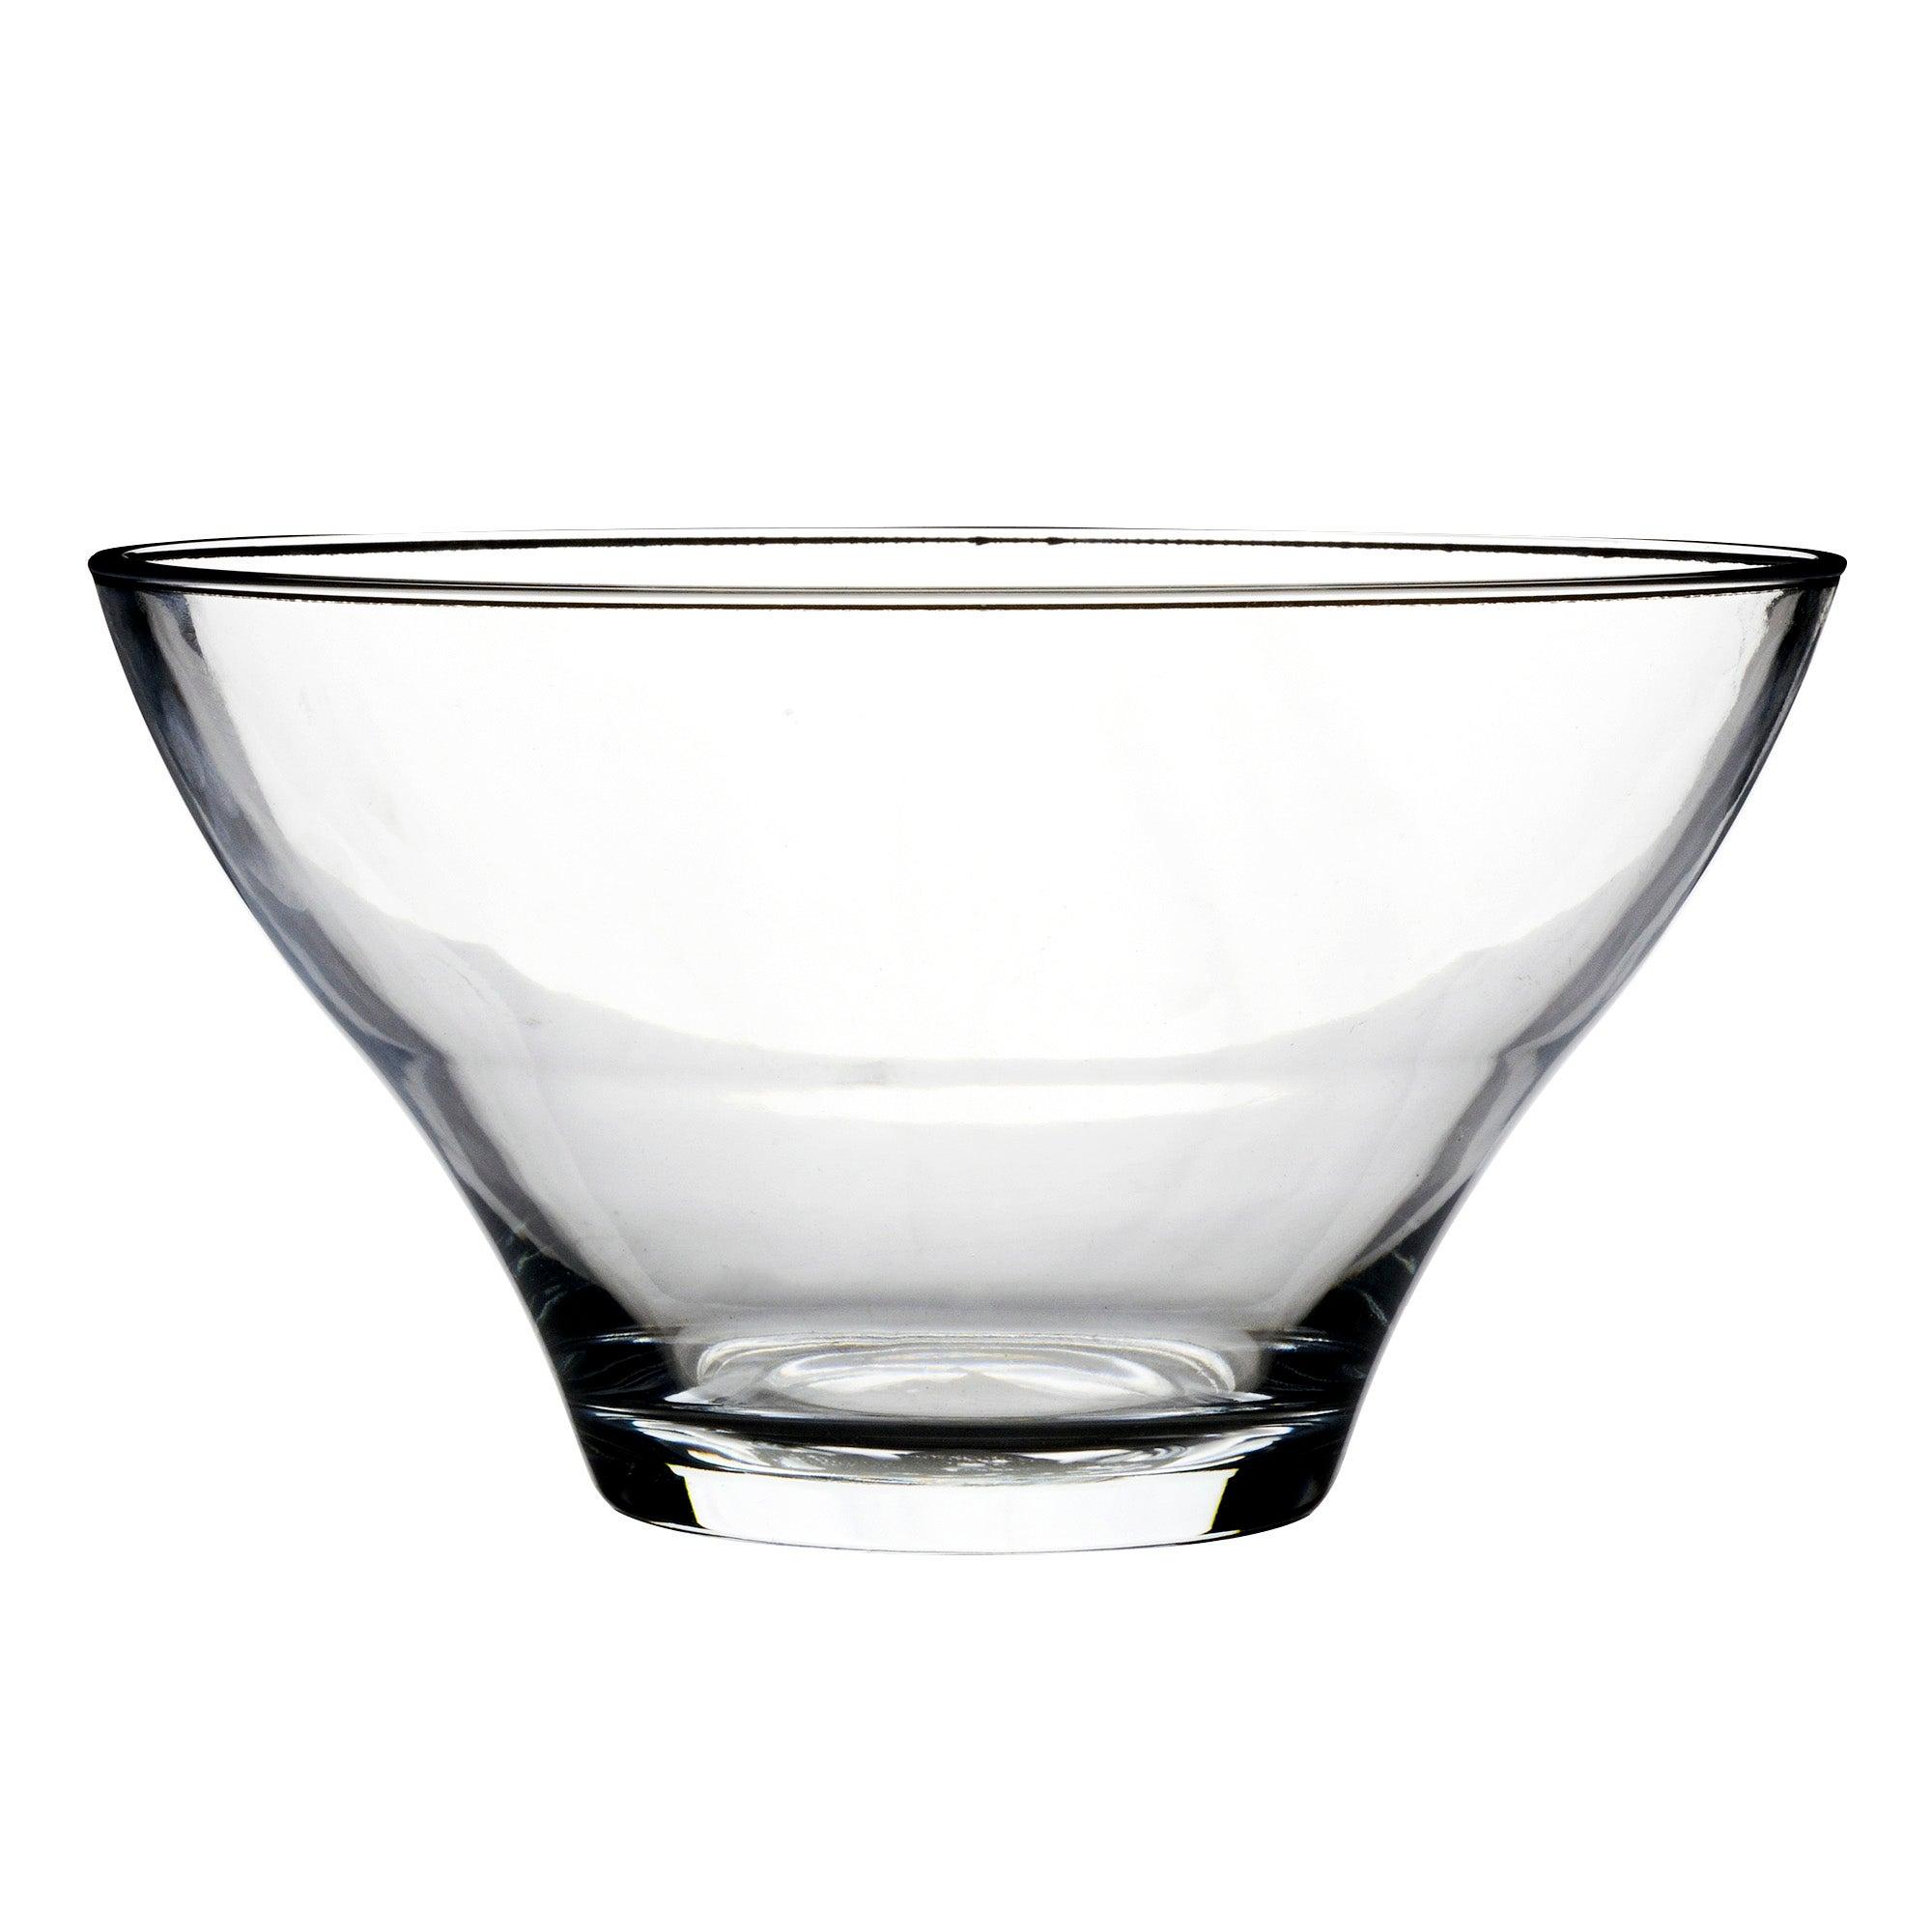 Ophelia Serve Bowl Large